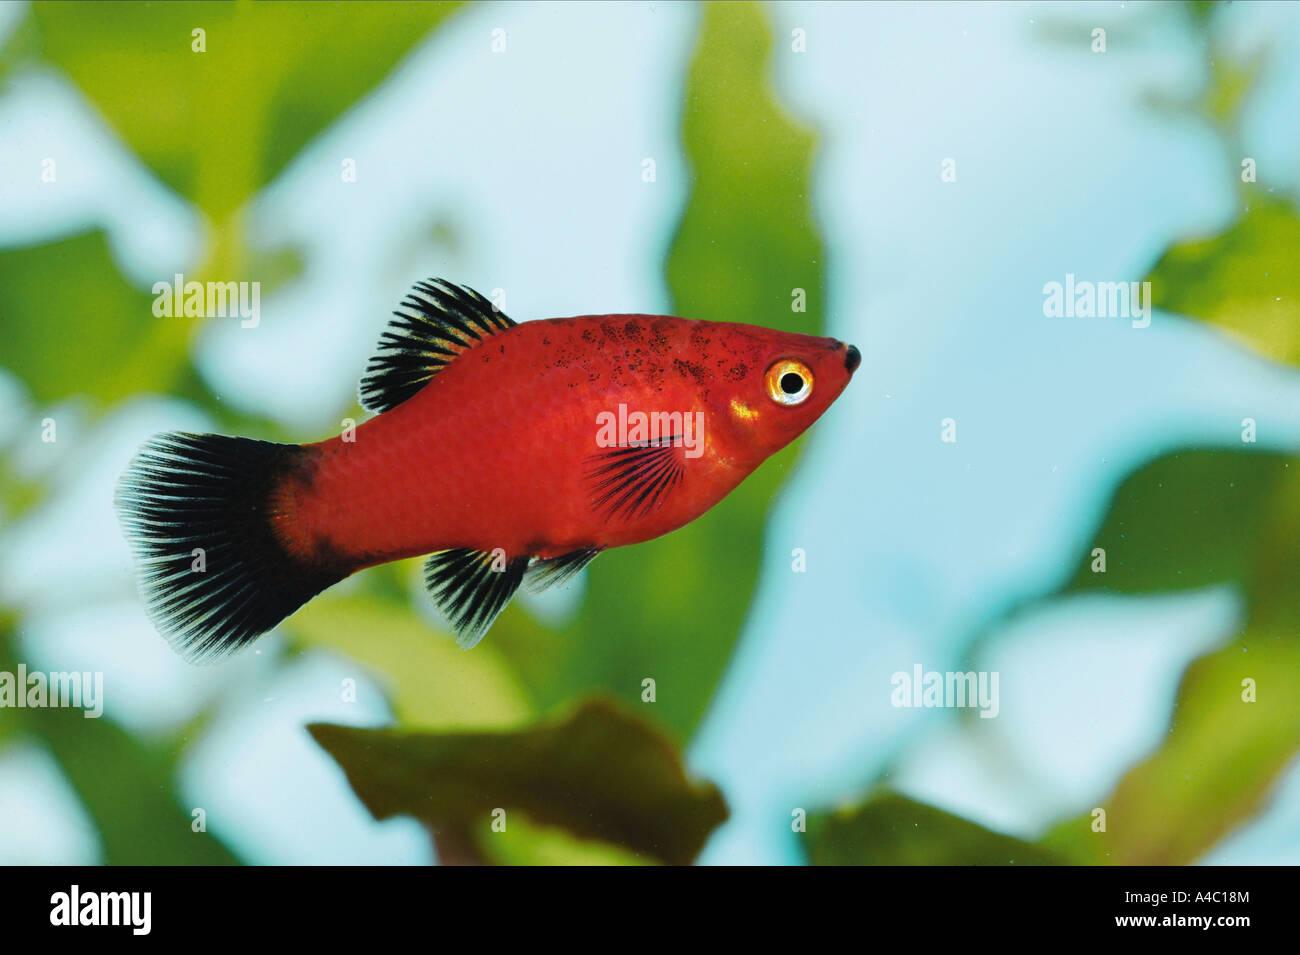 Platies Stock Photos & Platies Stock Images - Alamy